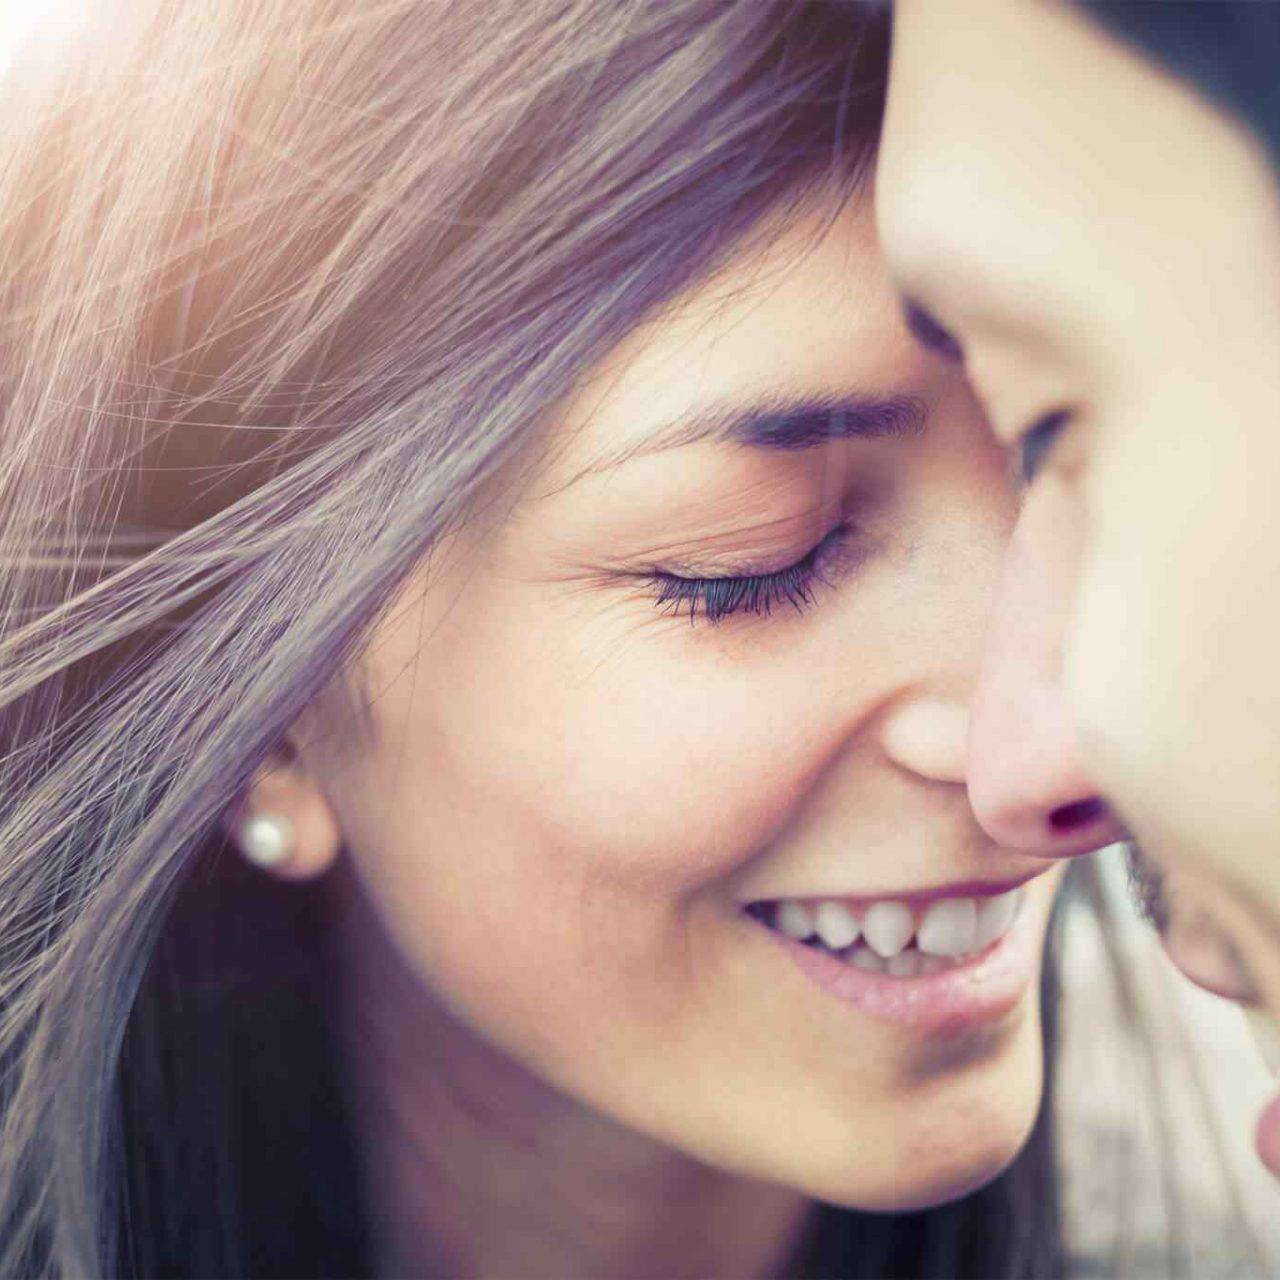 https://gotitasdepoliamor.com/wp-content/uploads/2018/01/img-class-marriage-01-1280x1280.jpg